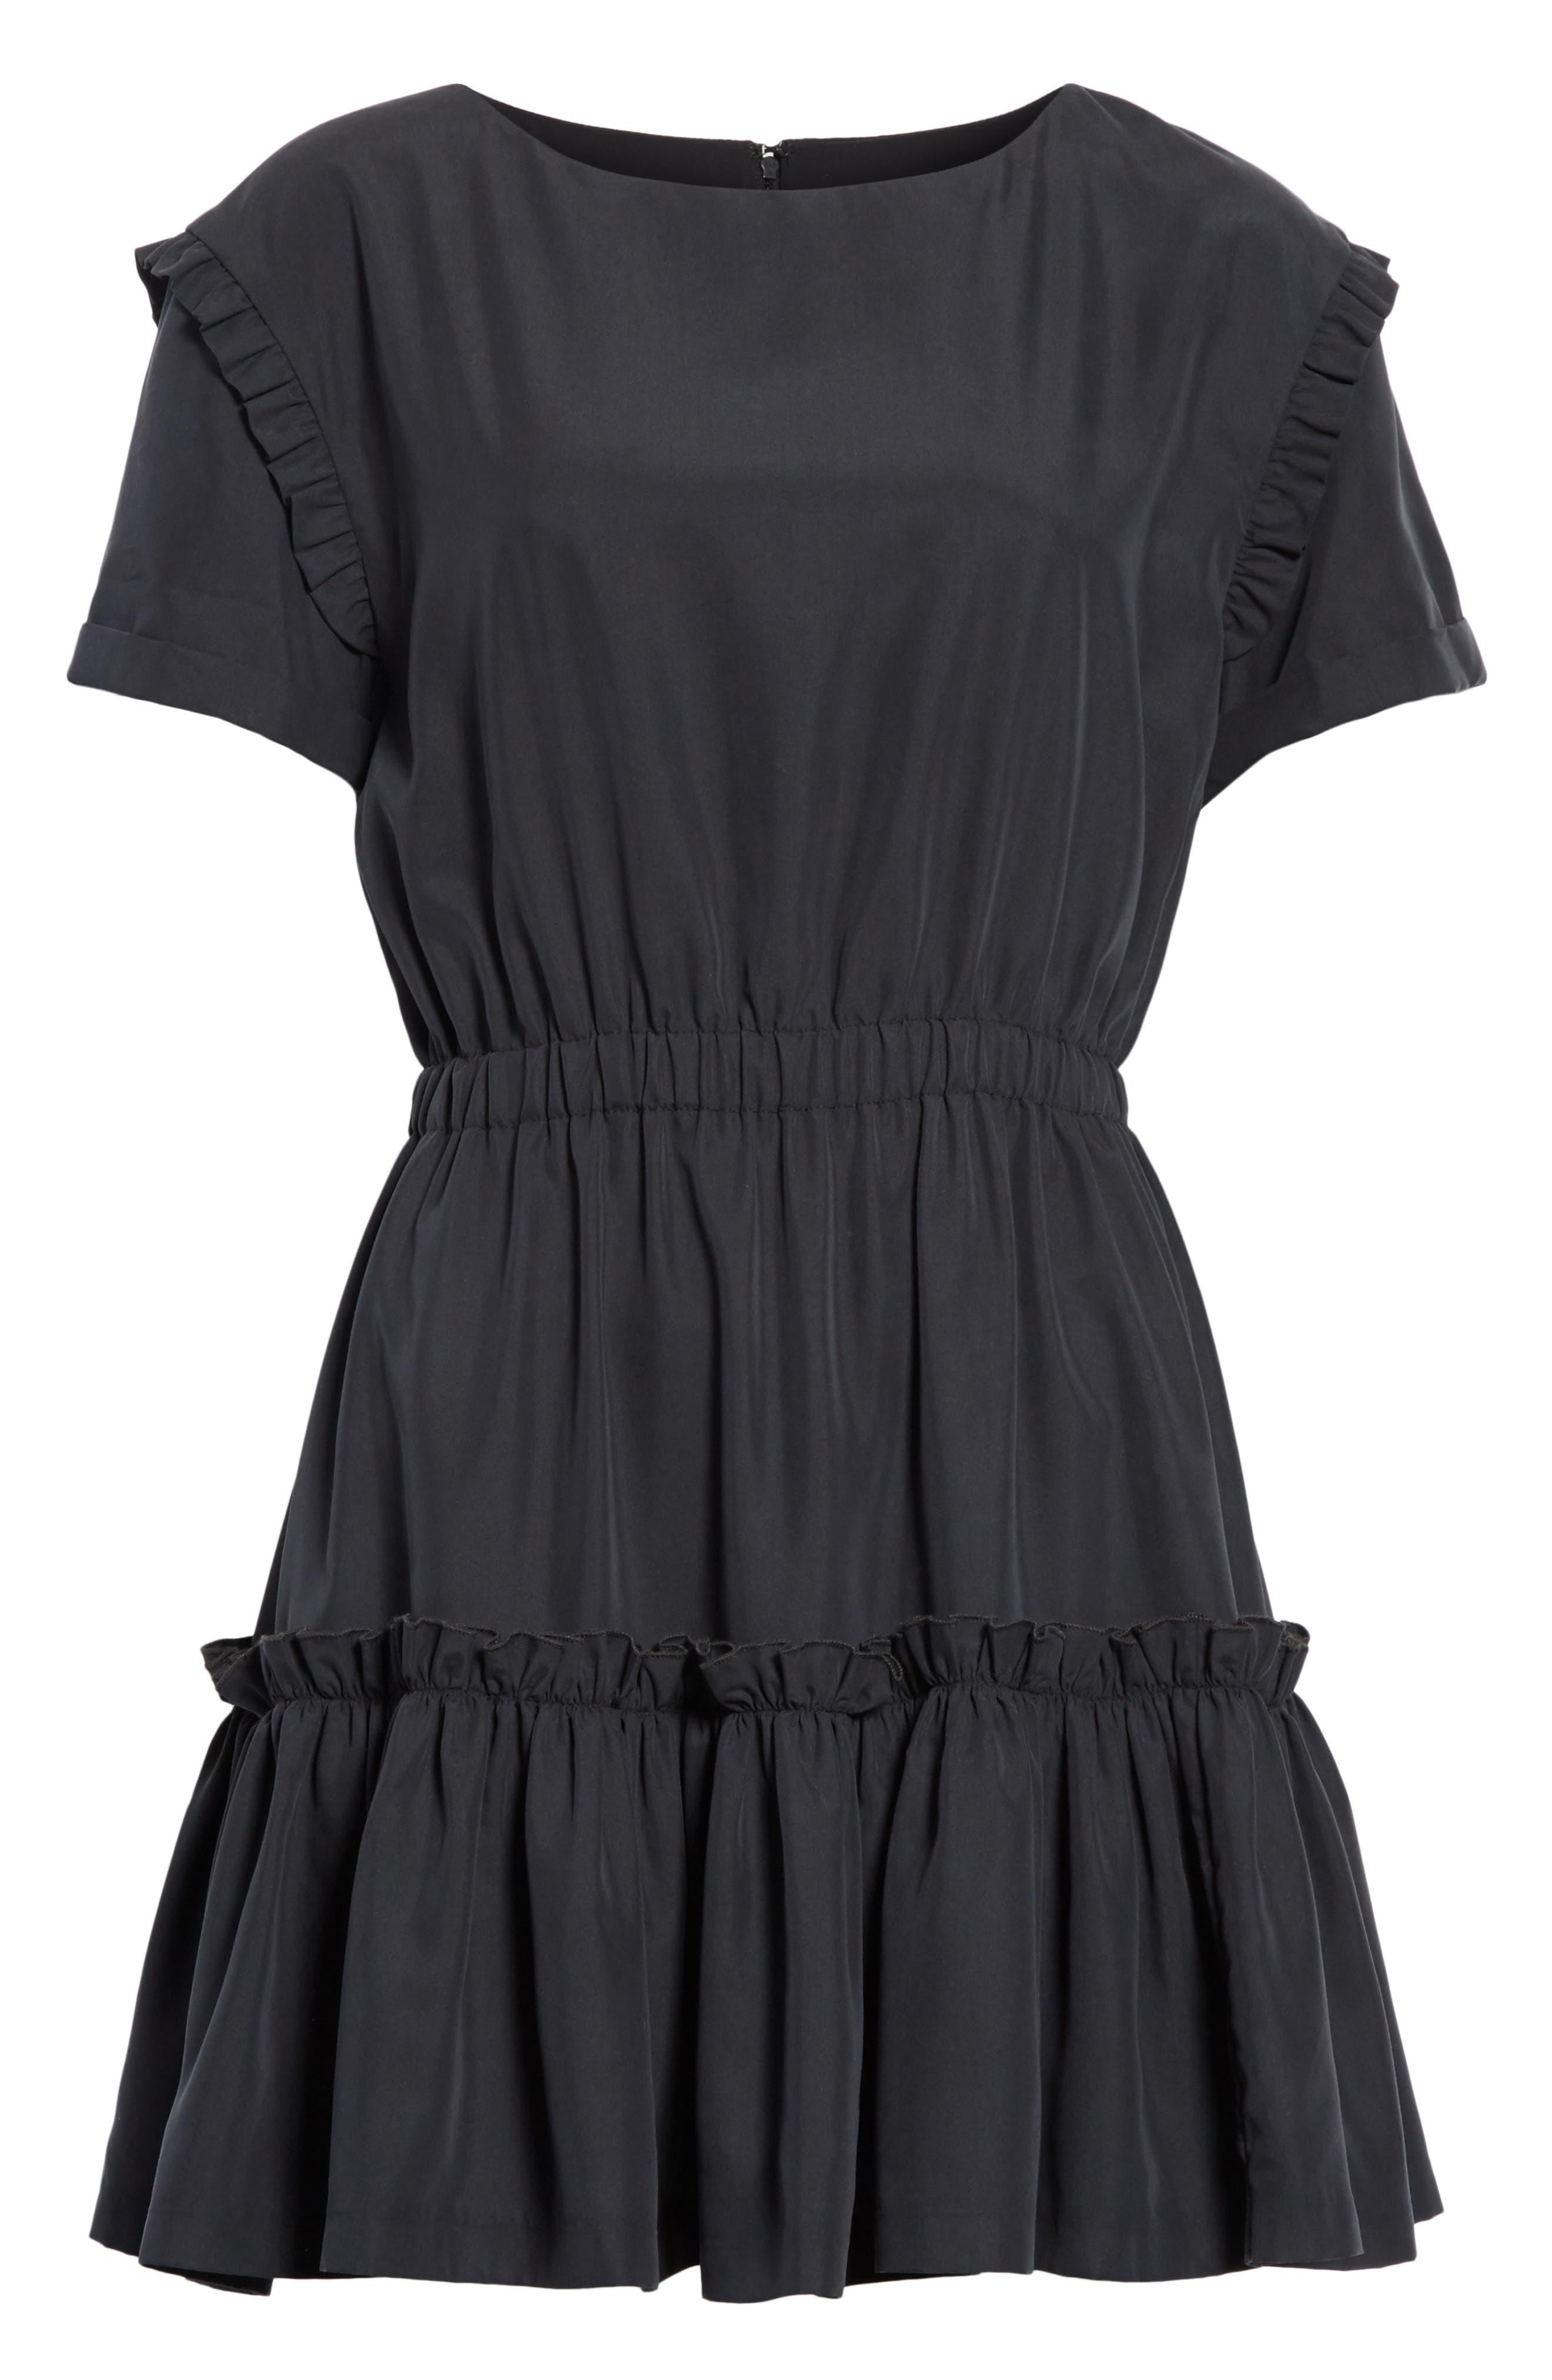 Garner Drop Shoulder Flounce Dress,                             Alternate thumbnail 6, color,                             001